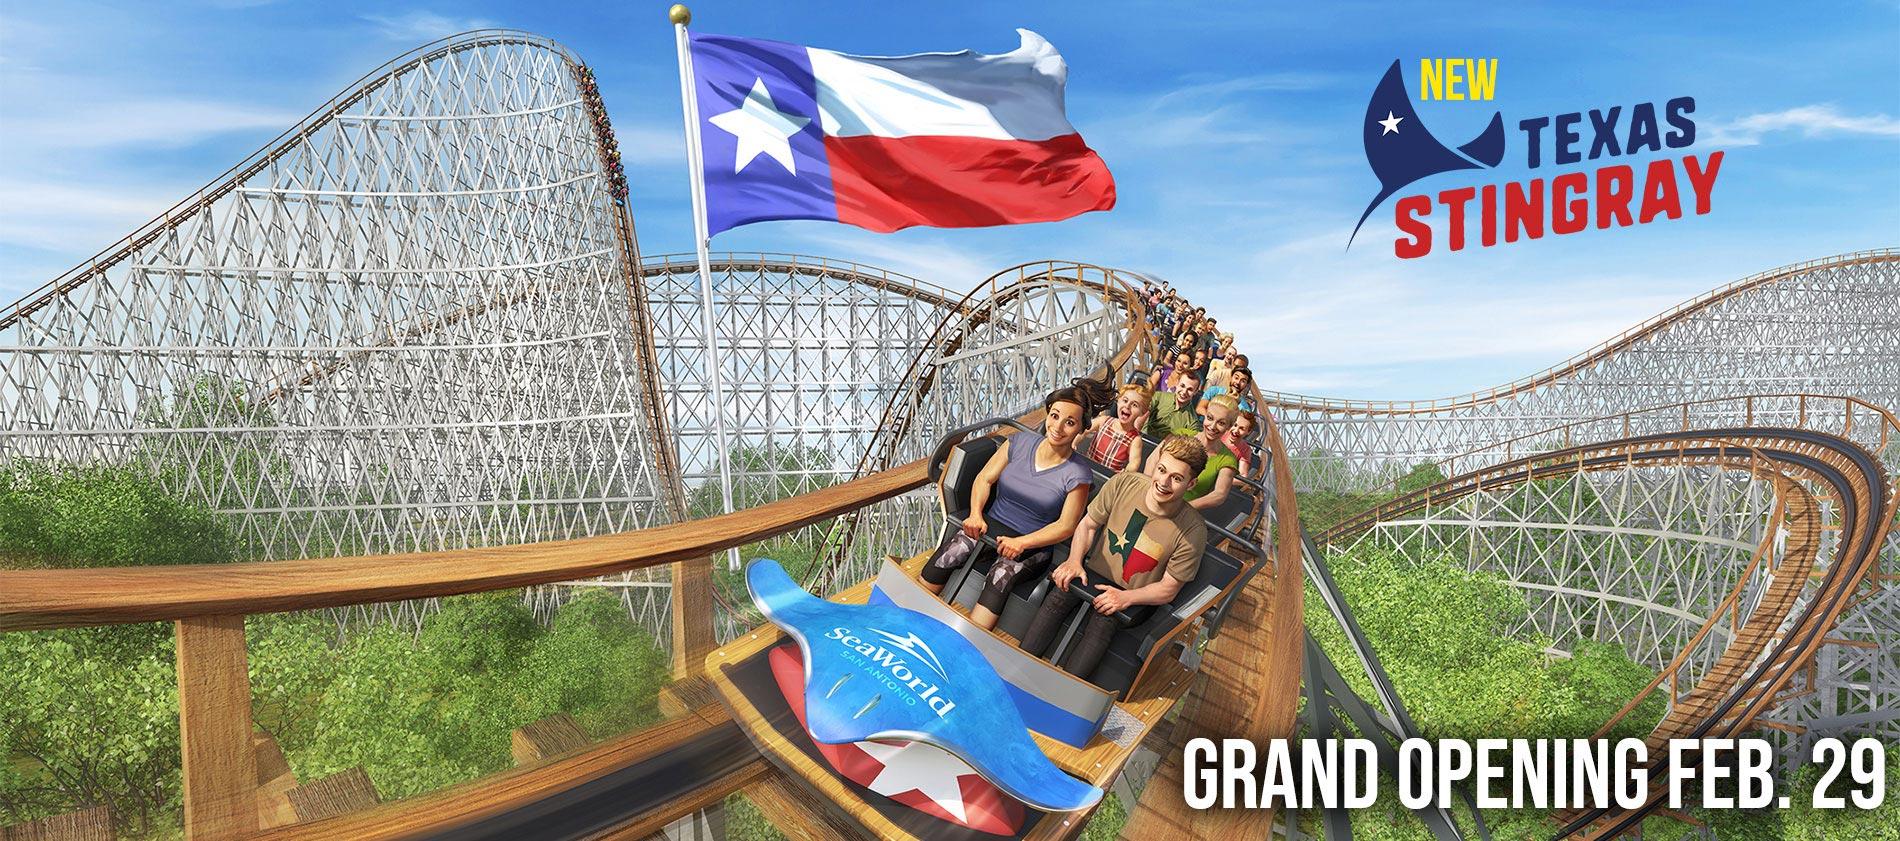 SeaWorld San Antonio Texas Stingray New Wooden Roller Coaster